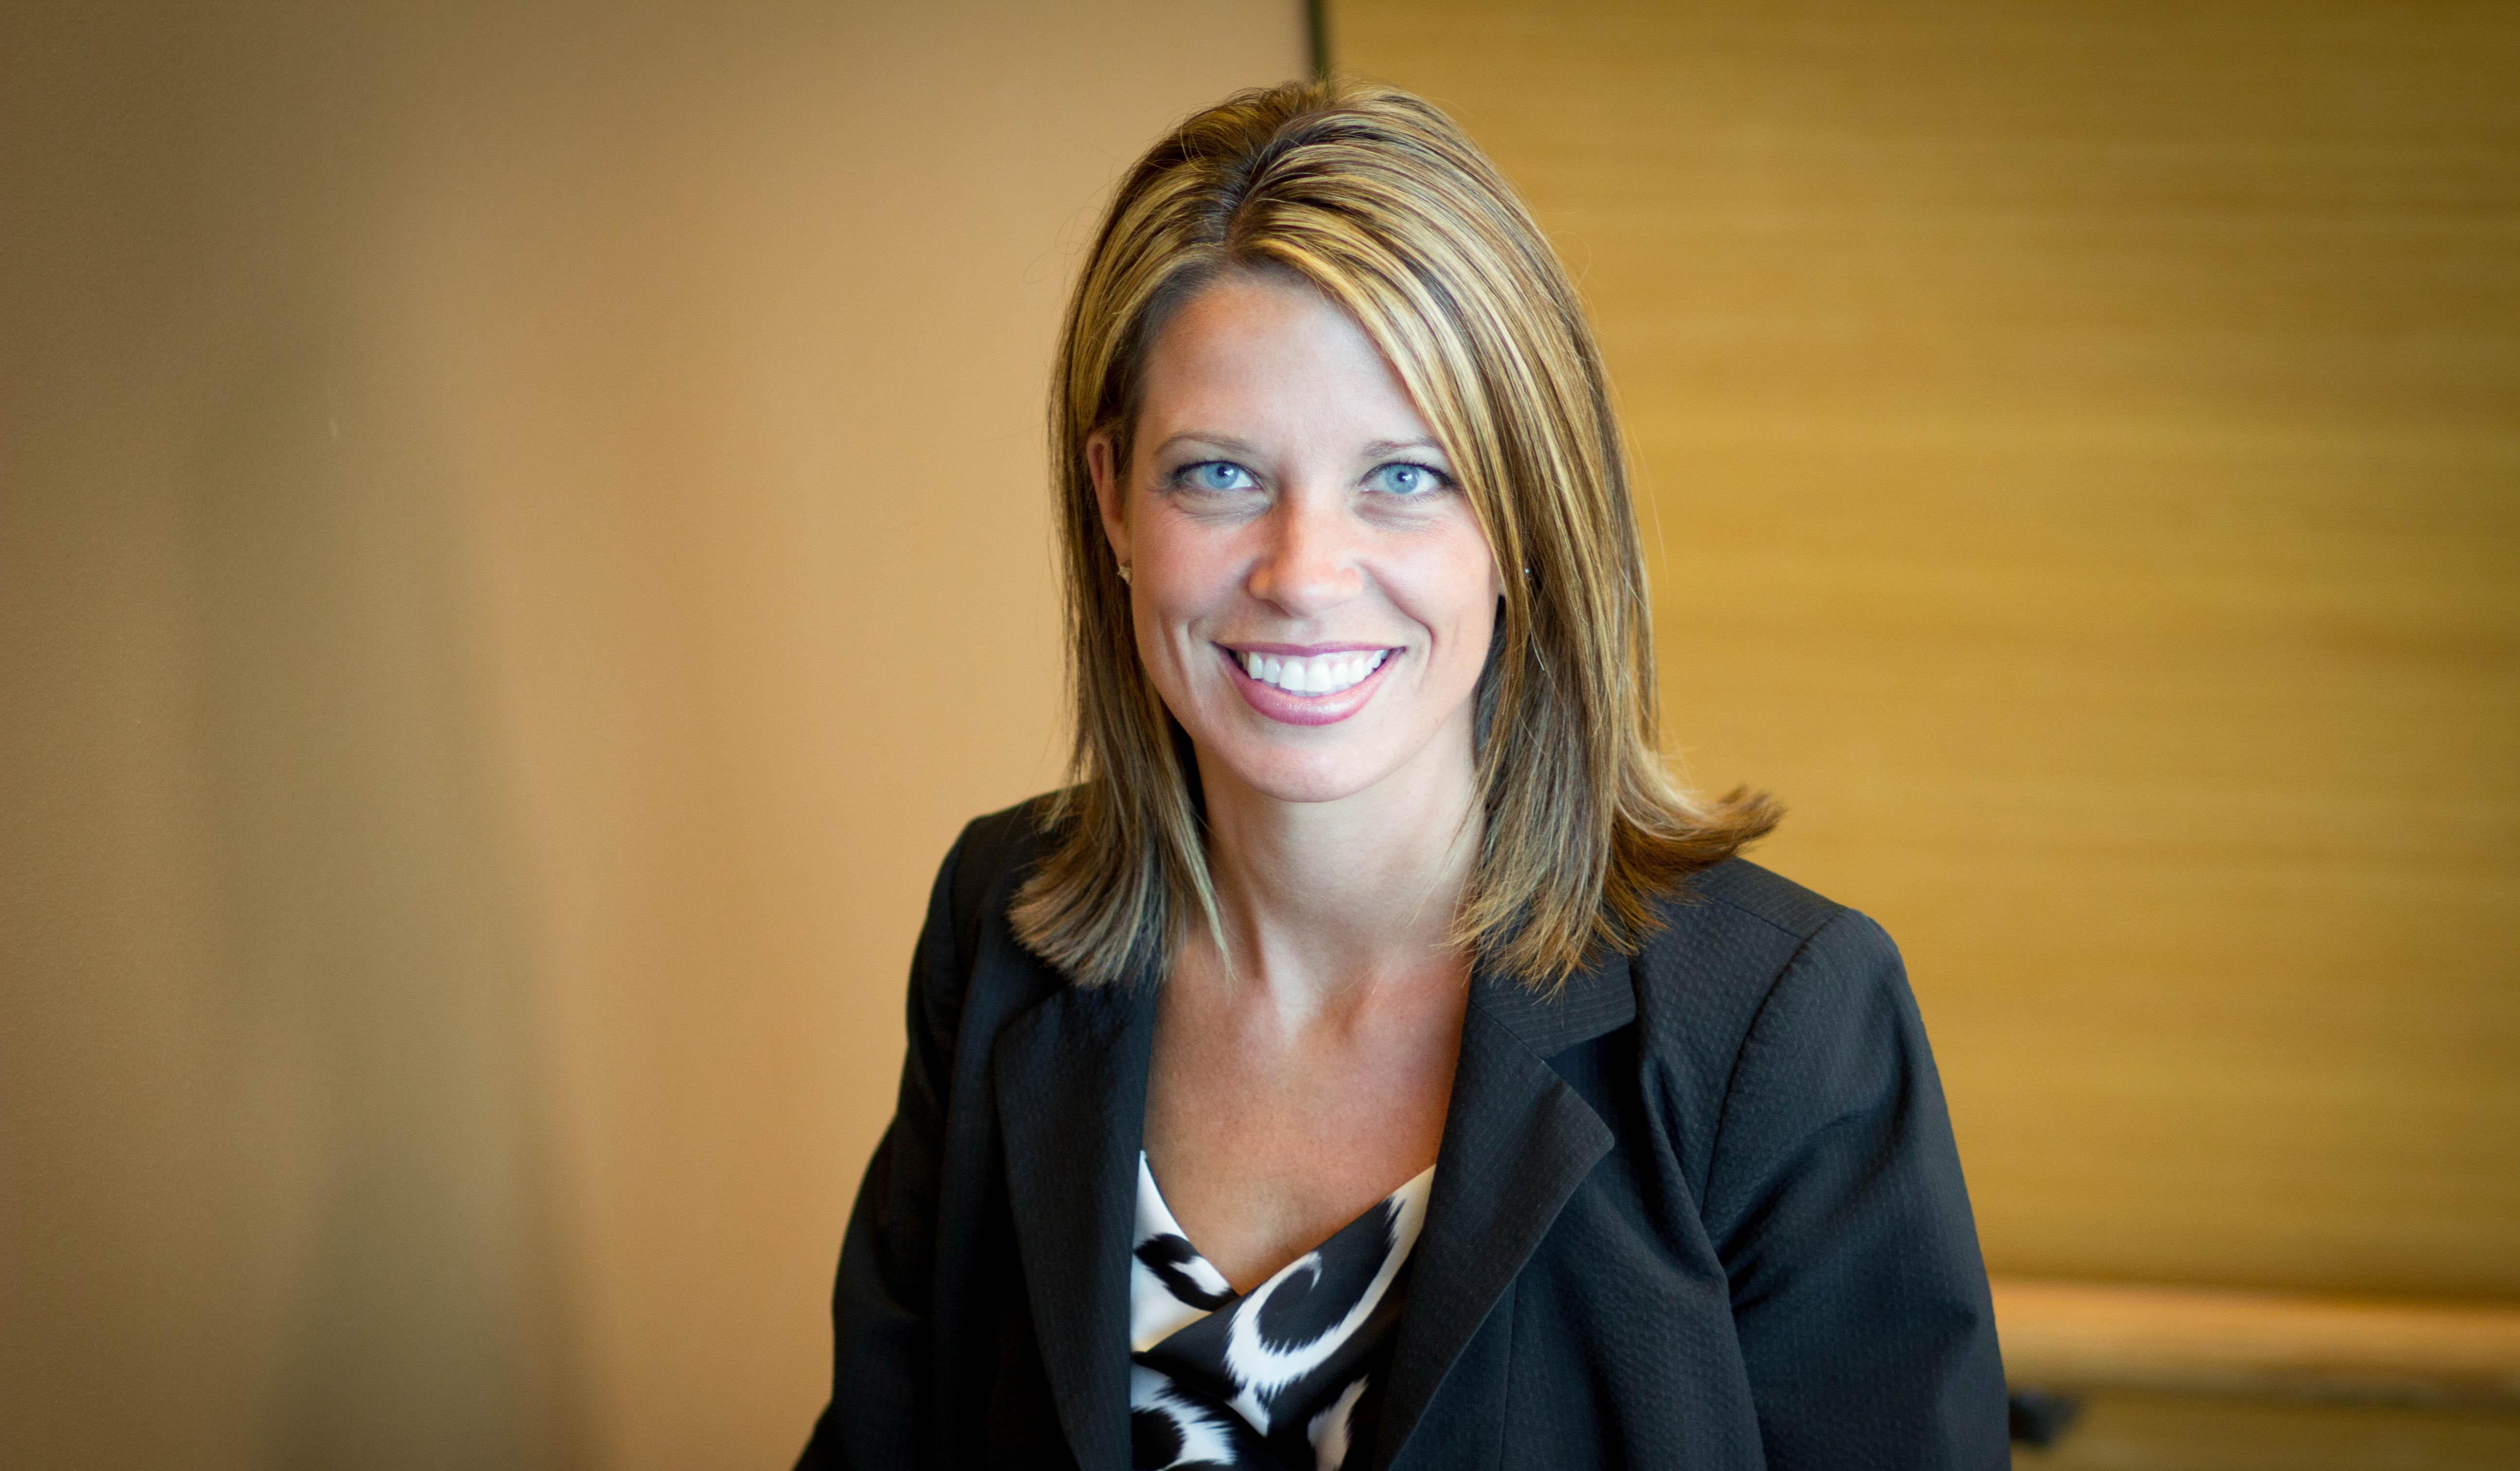 Angela Perkins Vp Of Sales And Marketing Xenium